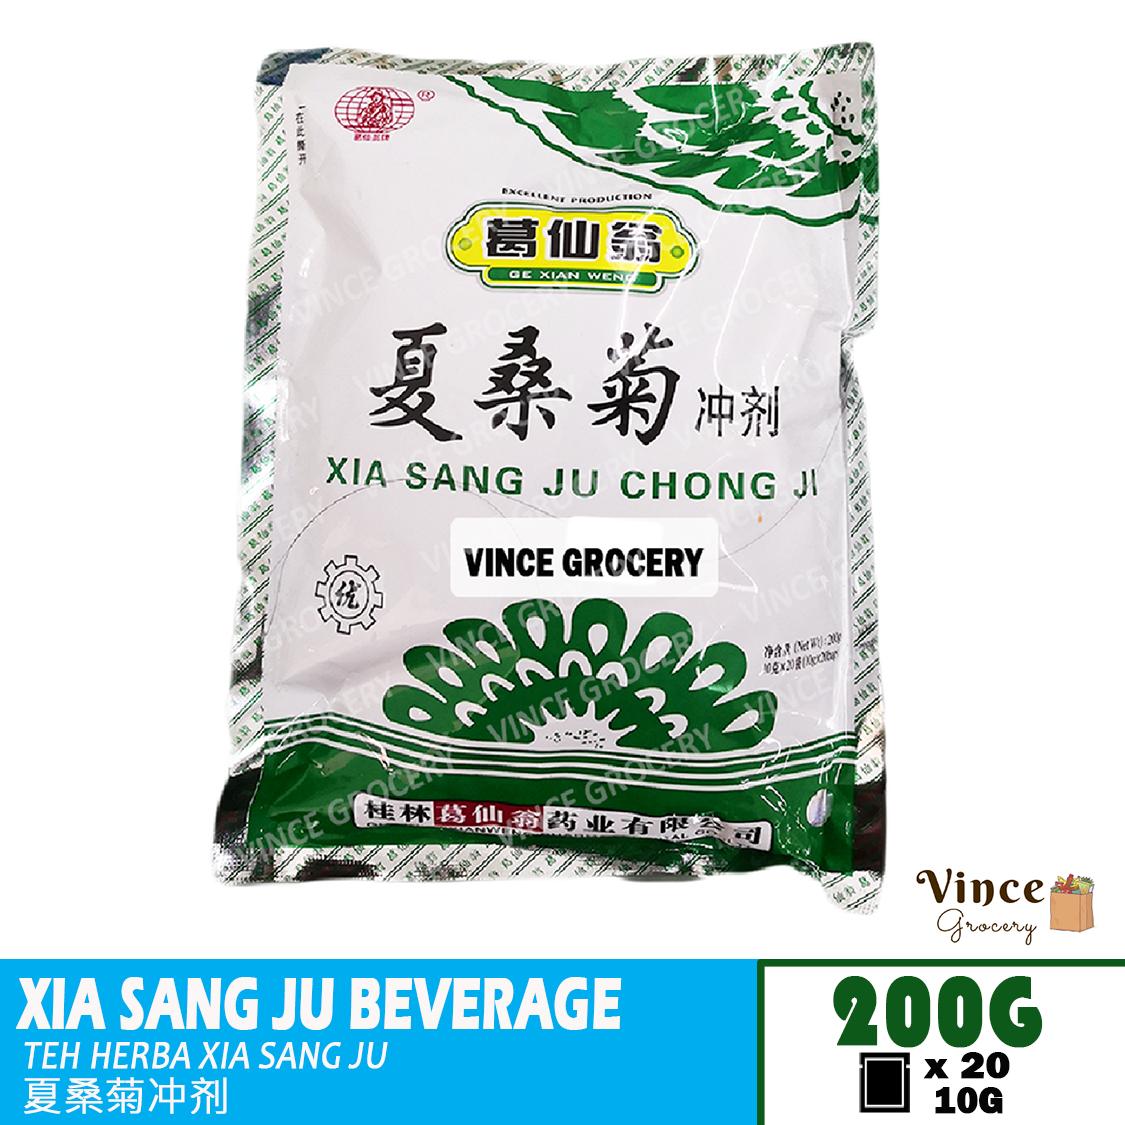 GE XIAN WENG Xia Sang Ju Beverage  葛仙翁夏桑菊冲剂 200G (20's x 10G)